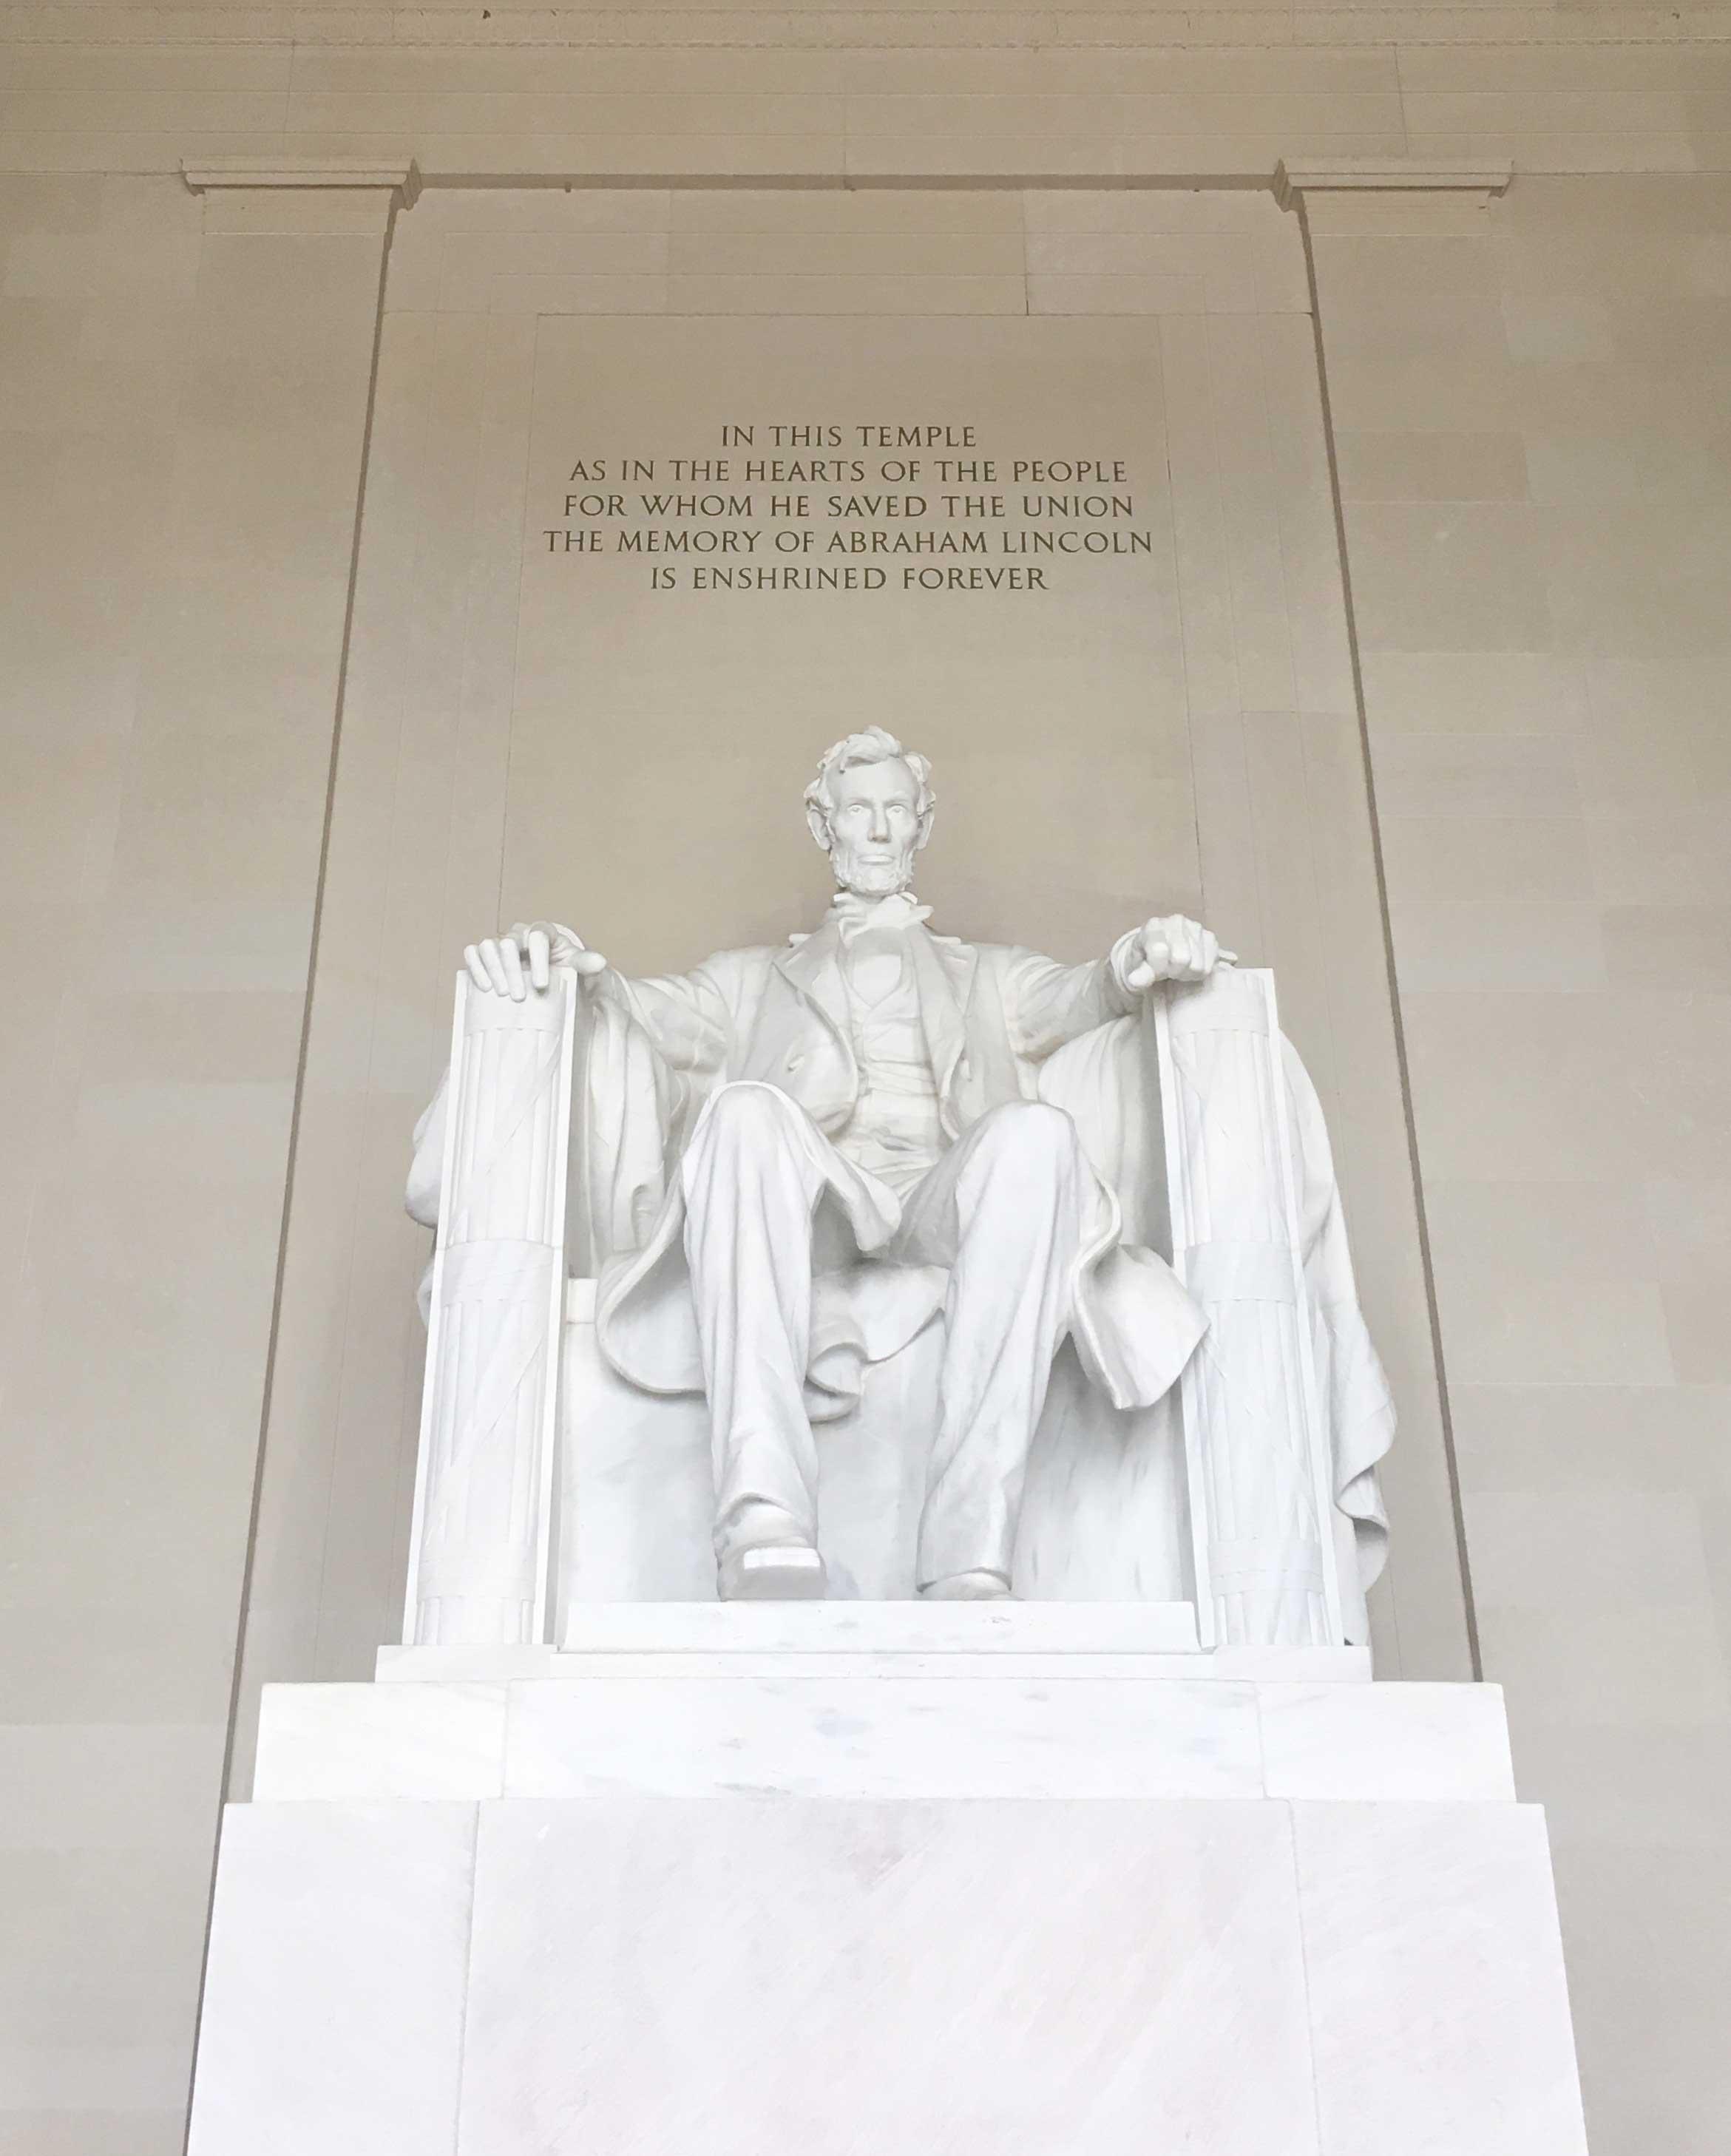 Lincoln Memorial in Washington D.C.